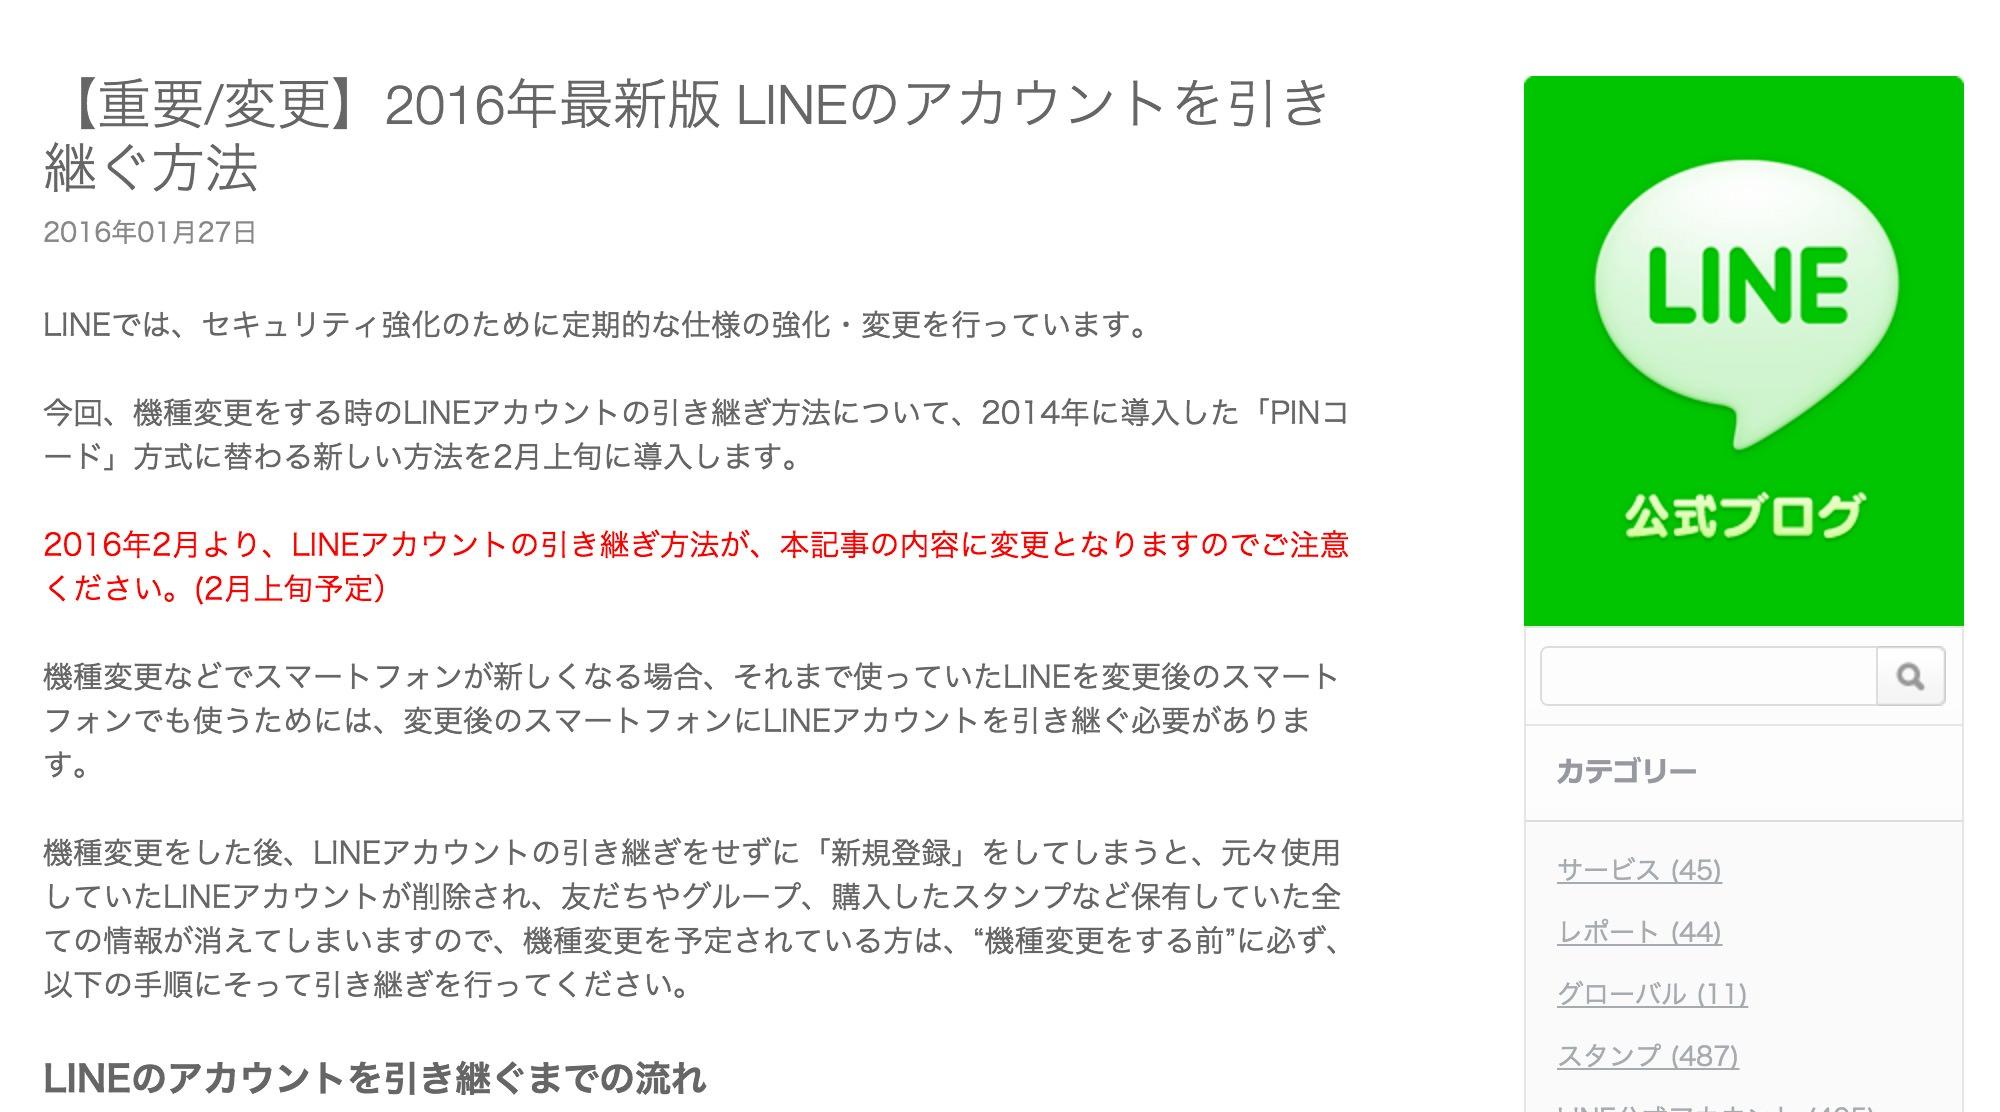 【LINE】2016年2月よりLINEアカウントを引き継ぐ方法が変更に